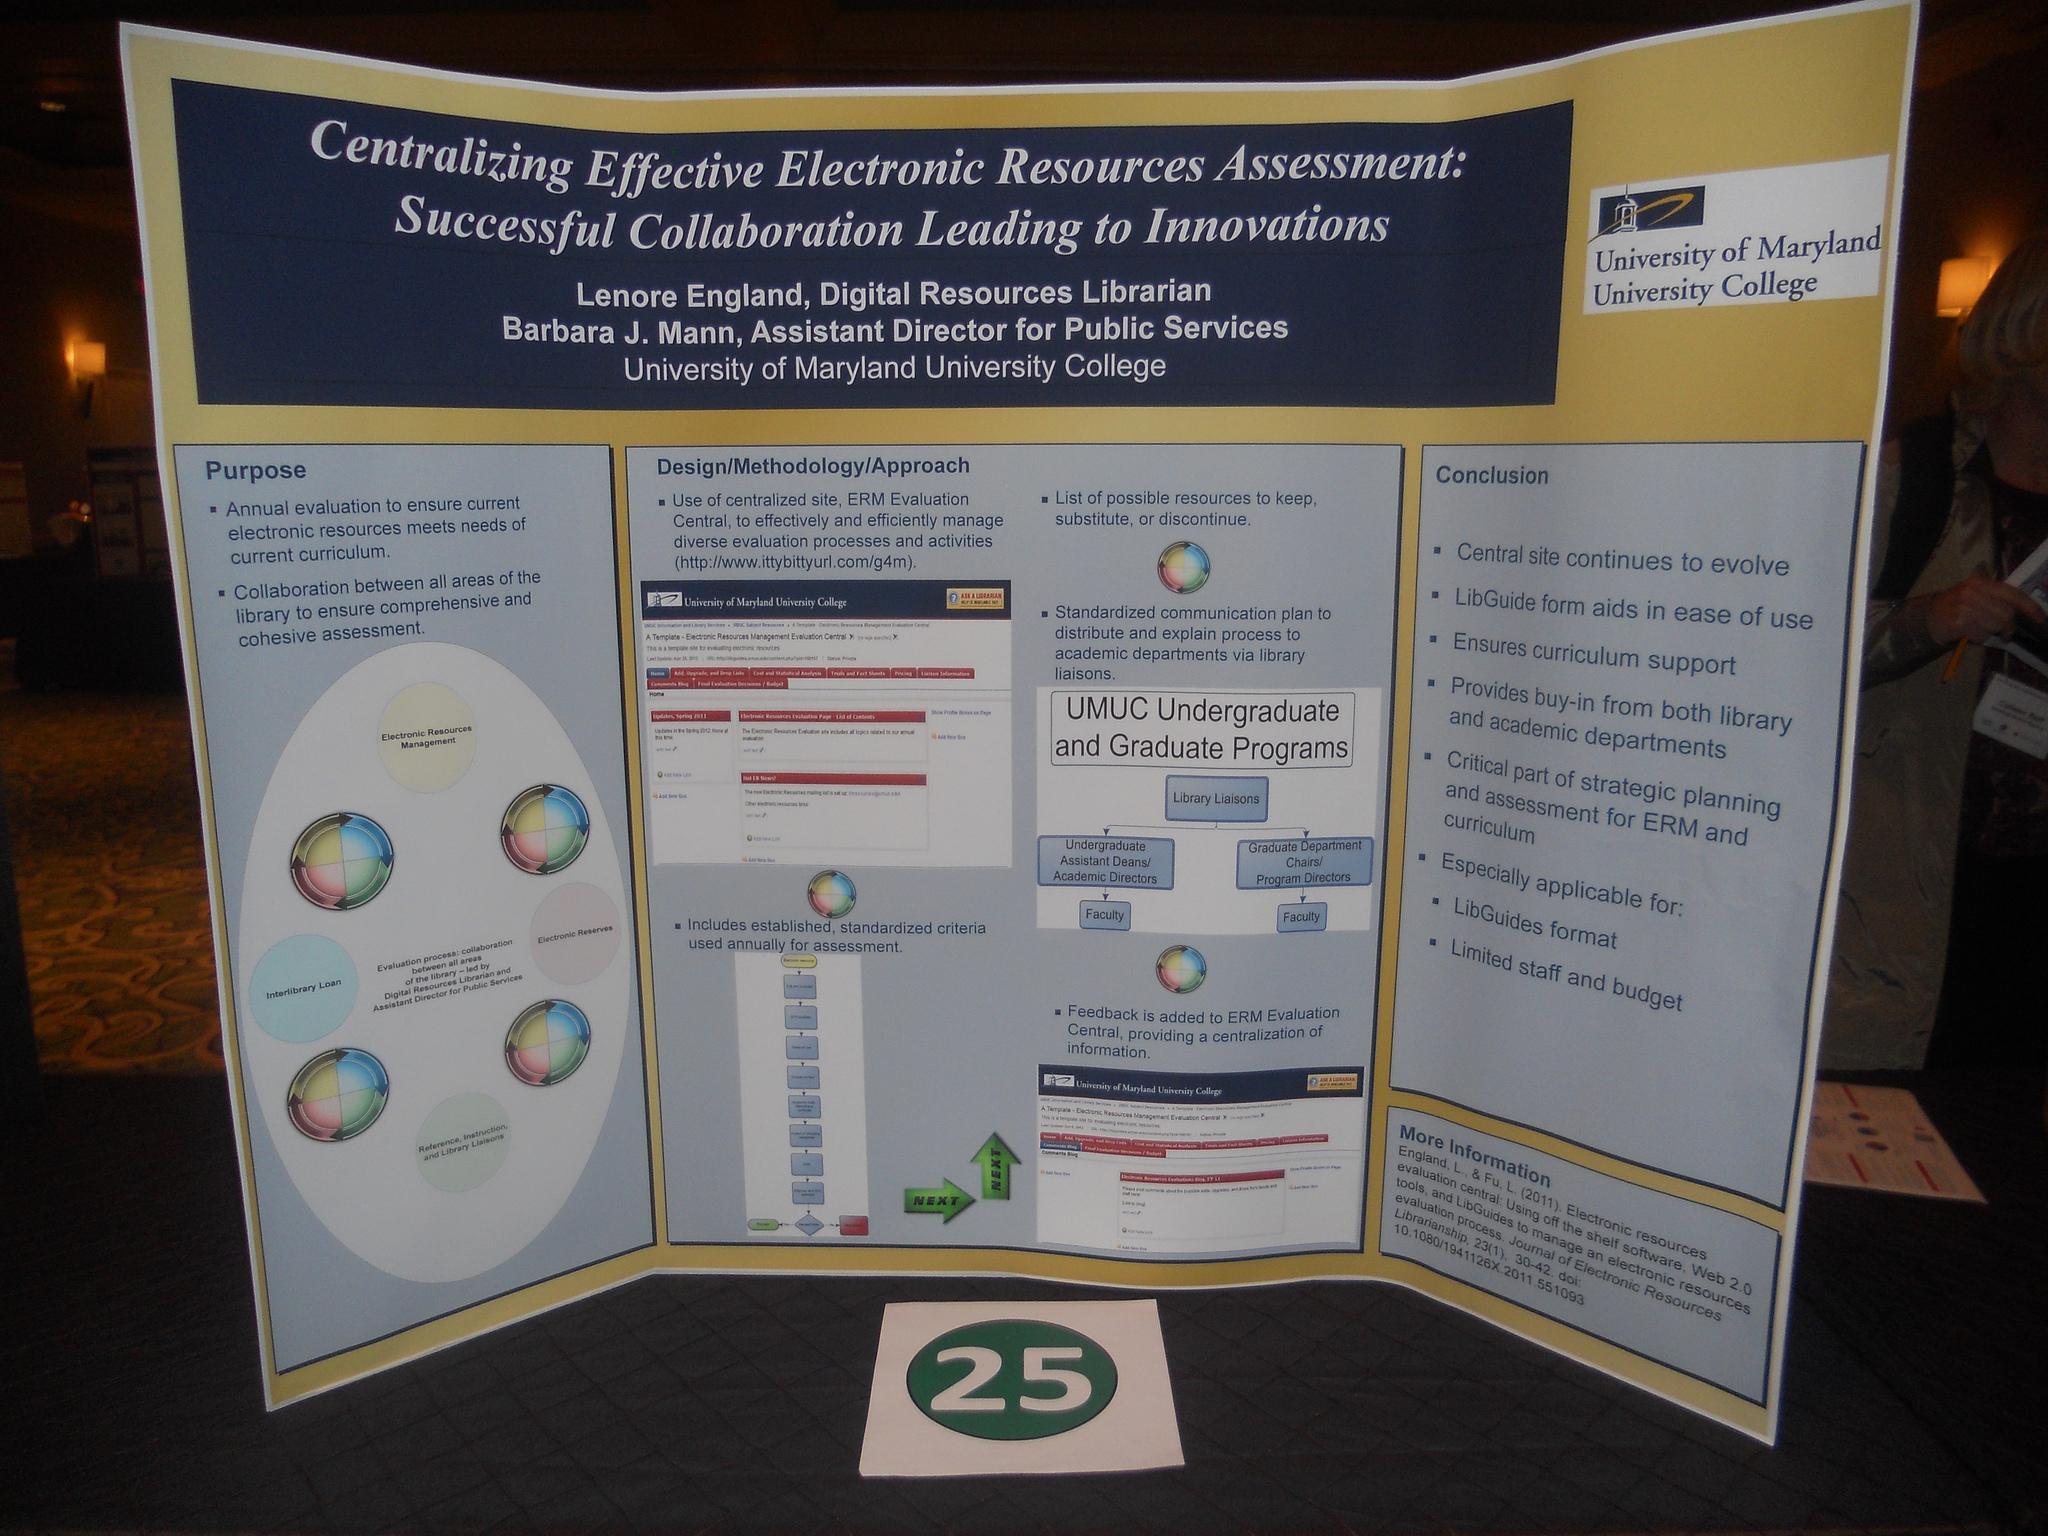 2012 poster presentations, College Presentation Poster Template, Presentation templates